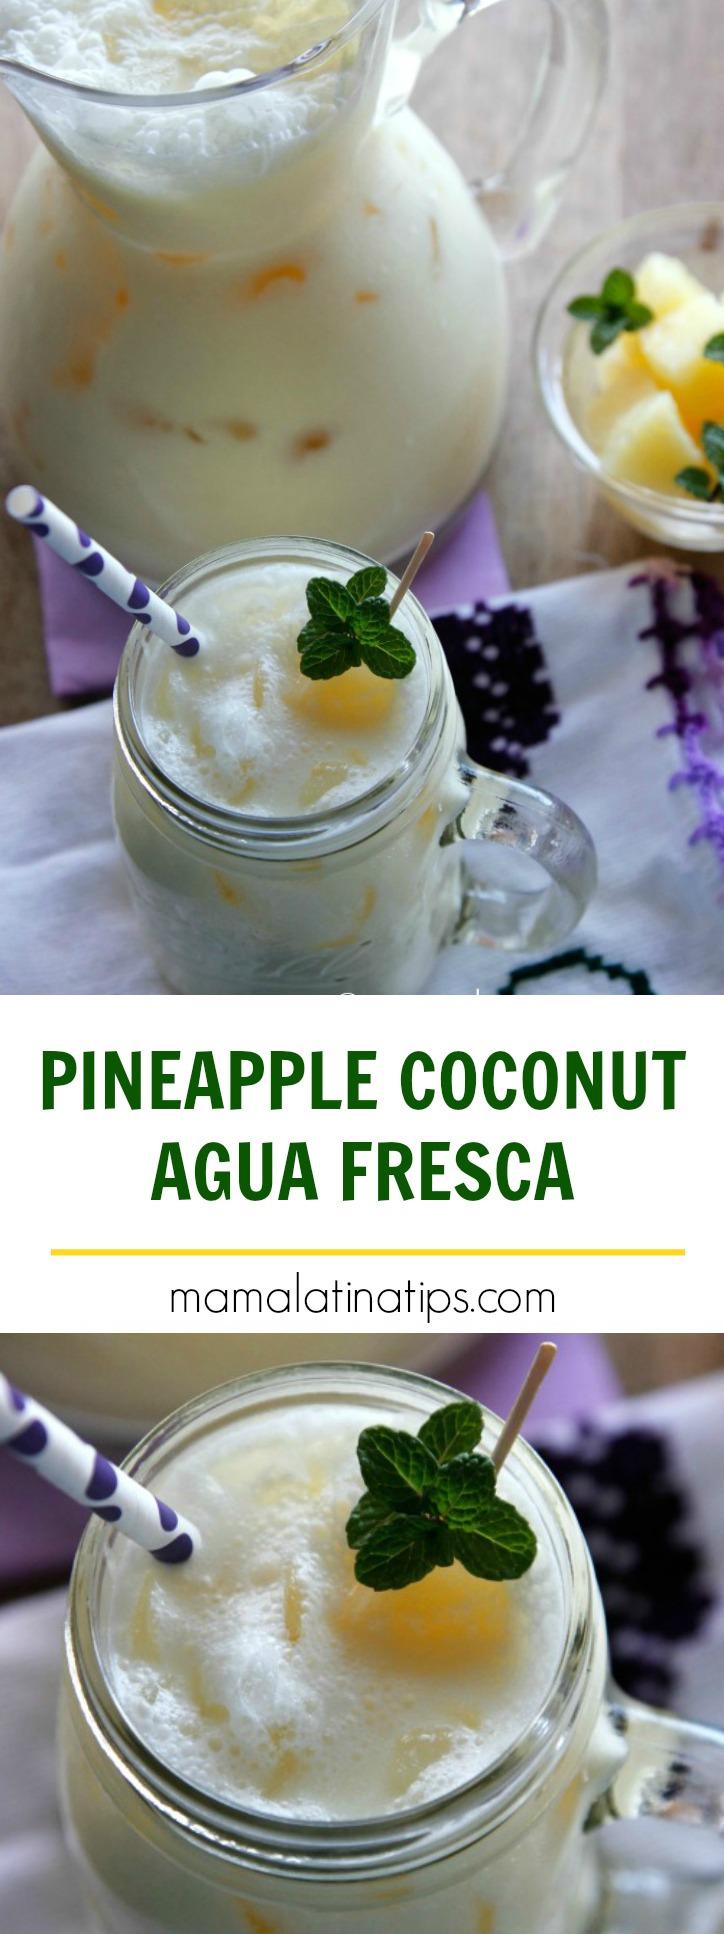 pineapple coconut agua fresca